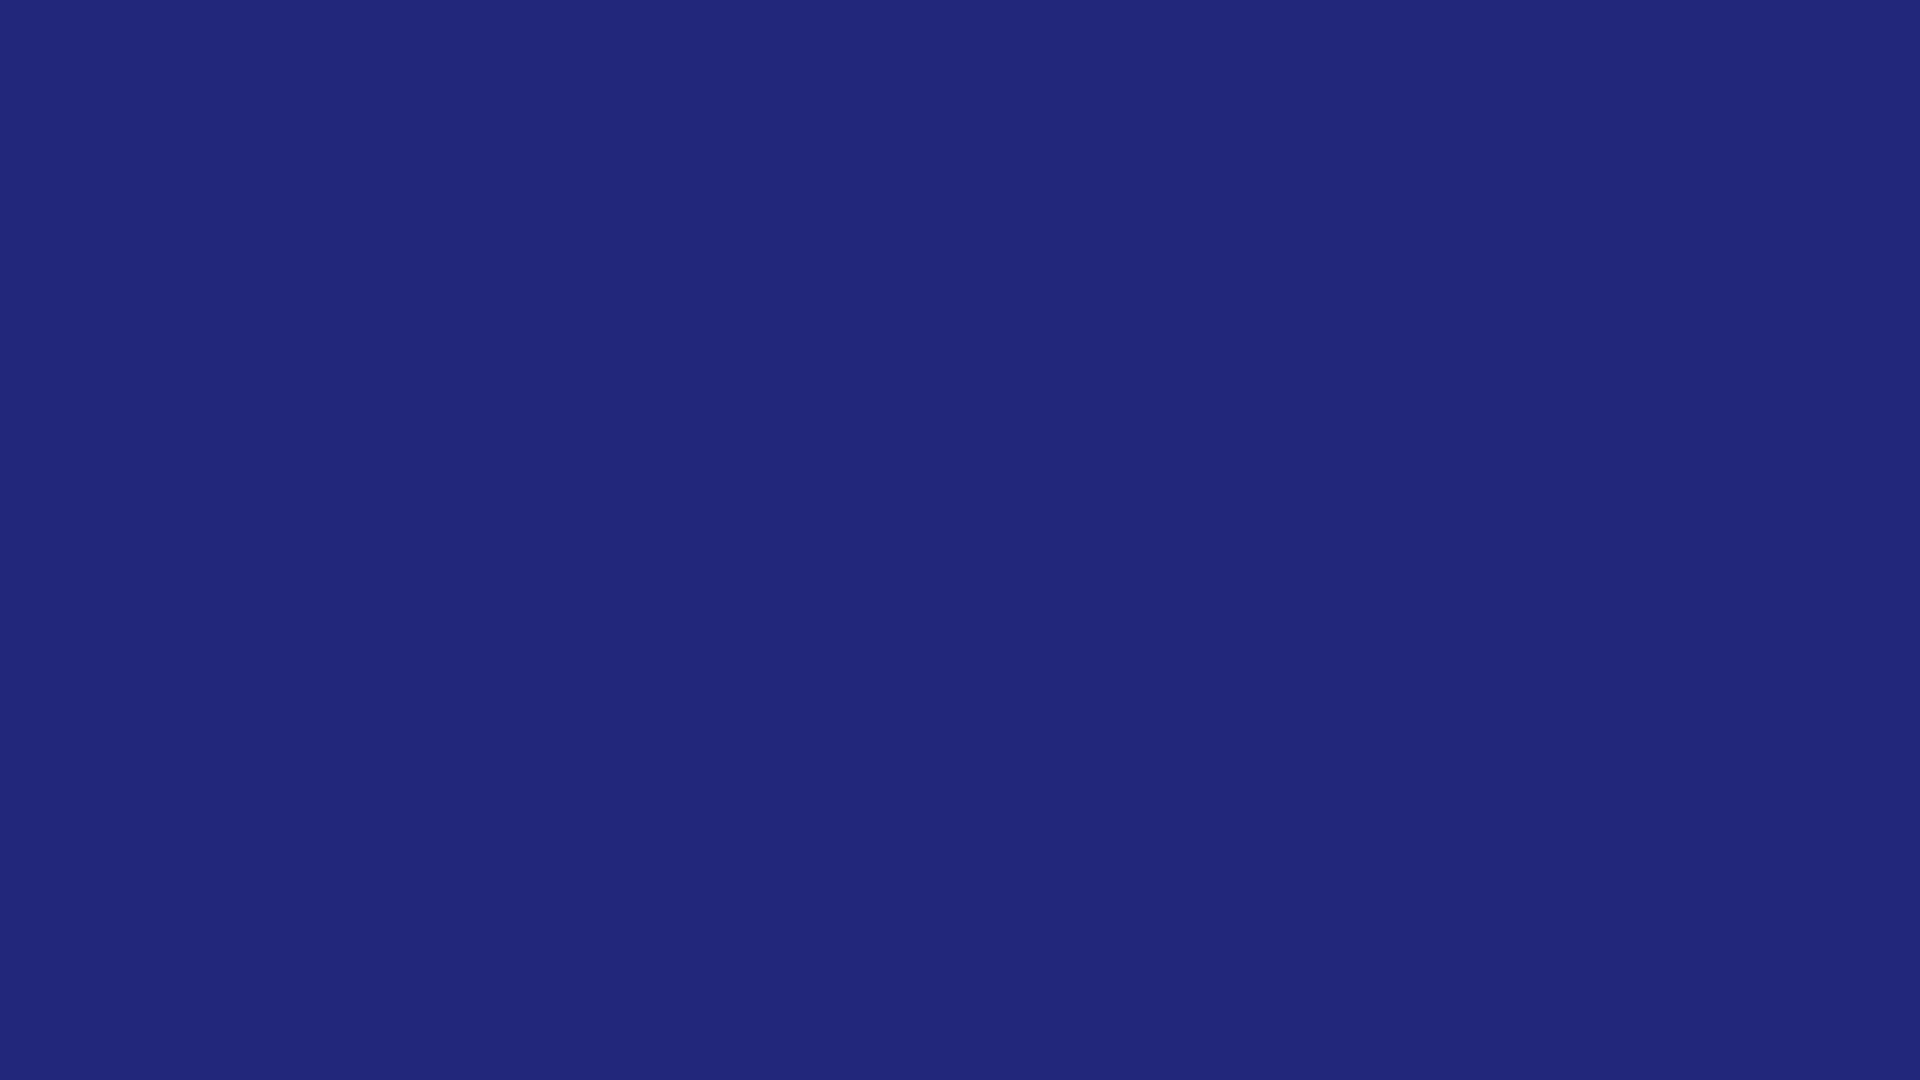 1920x1080 St Patricks Blue Solid Color Background